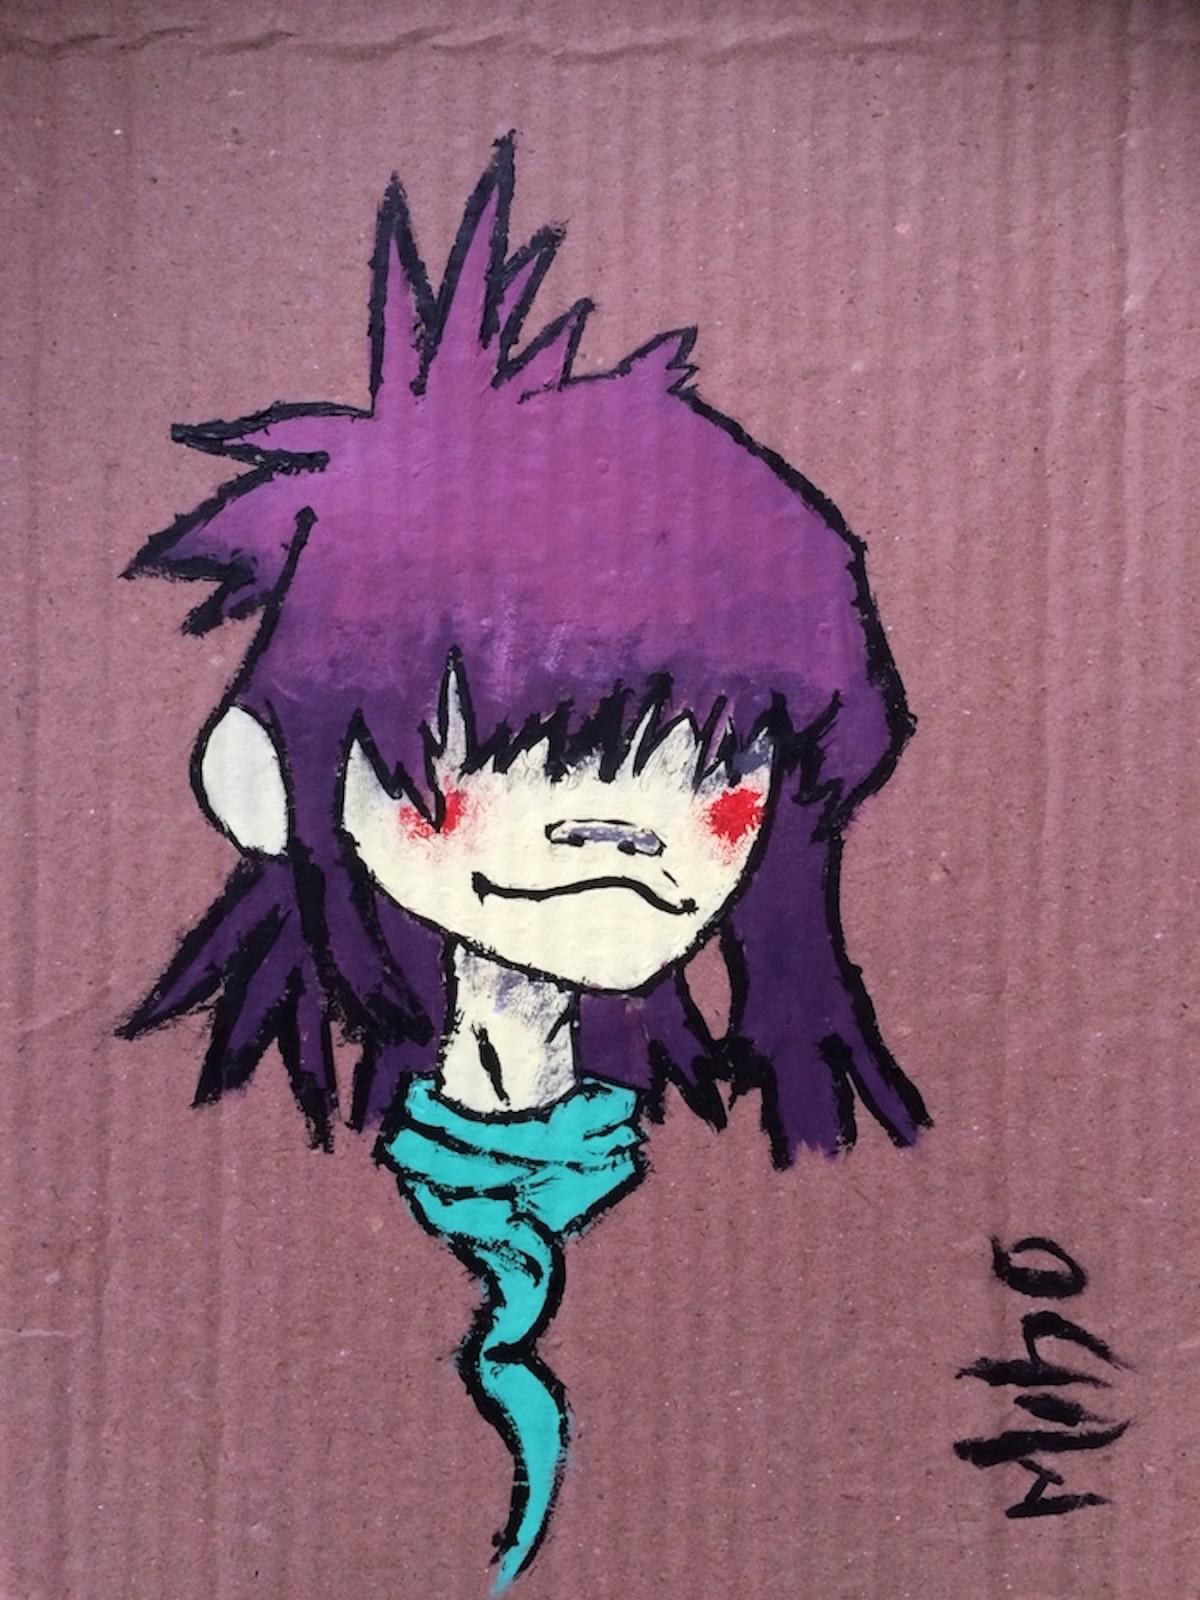 Noodle - Gorillaz (Cardboard)